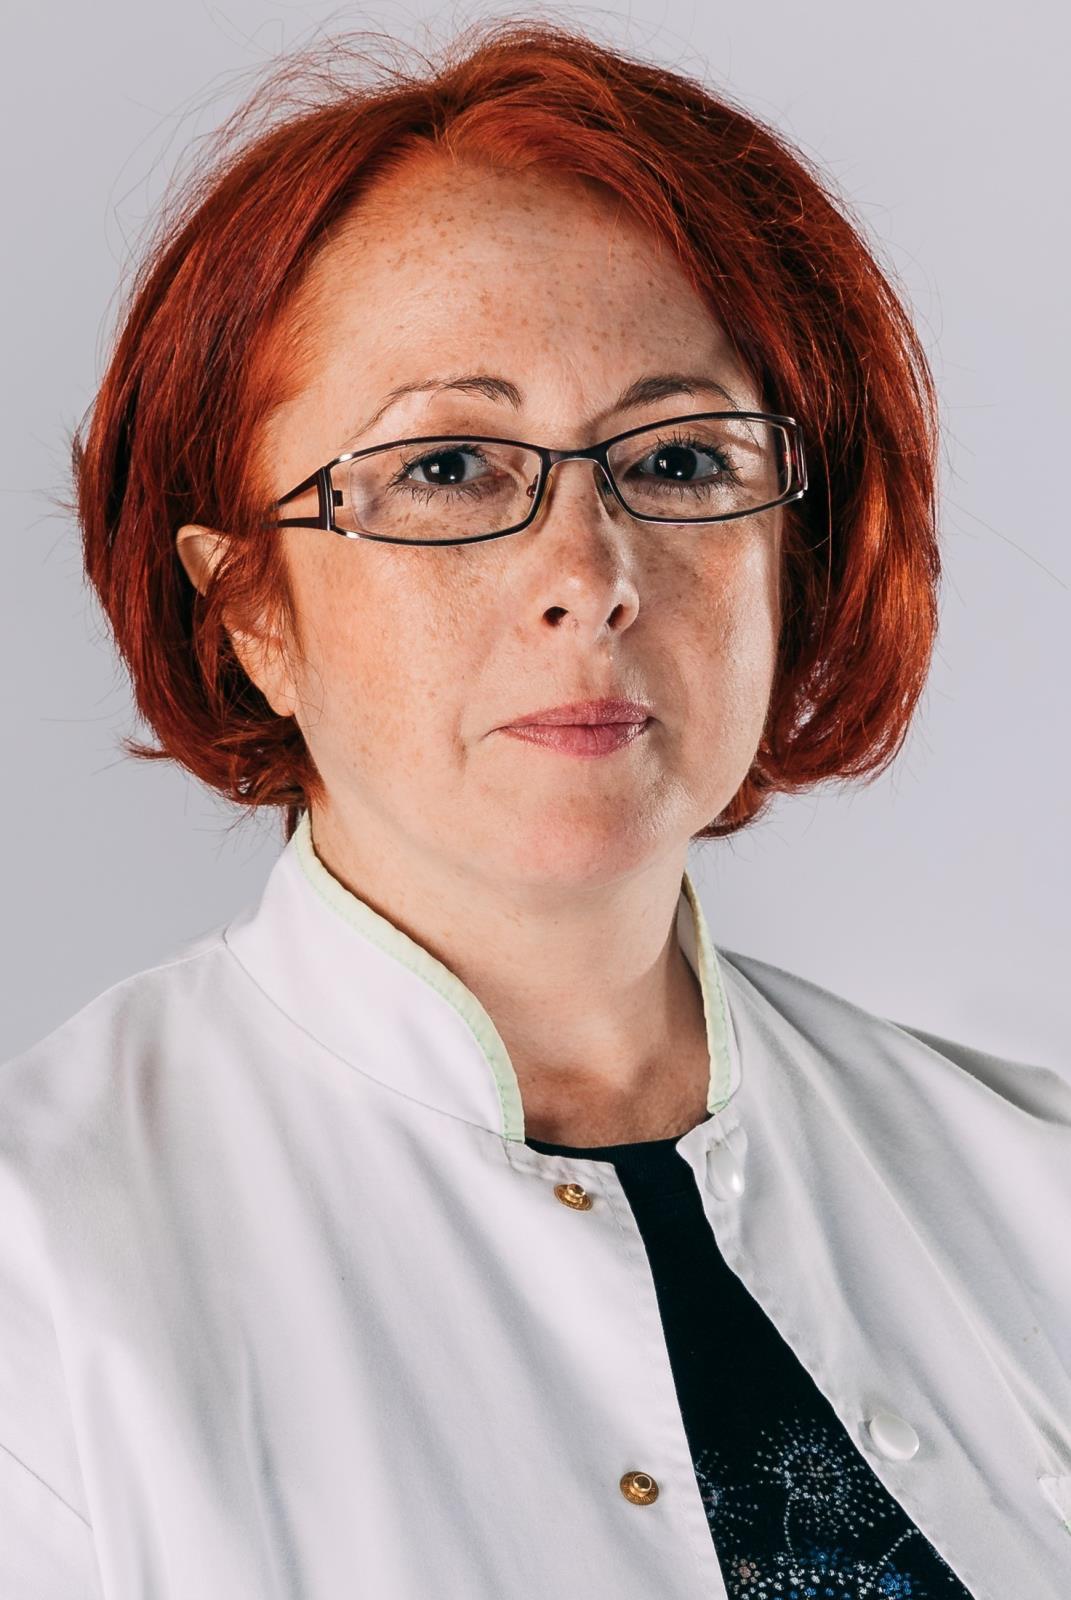 Stefania Budacu